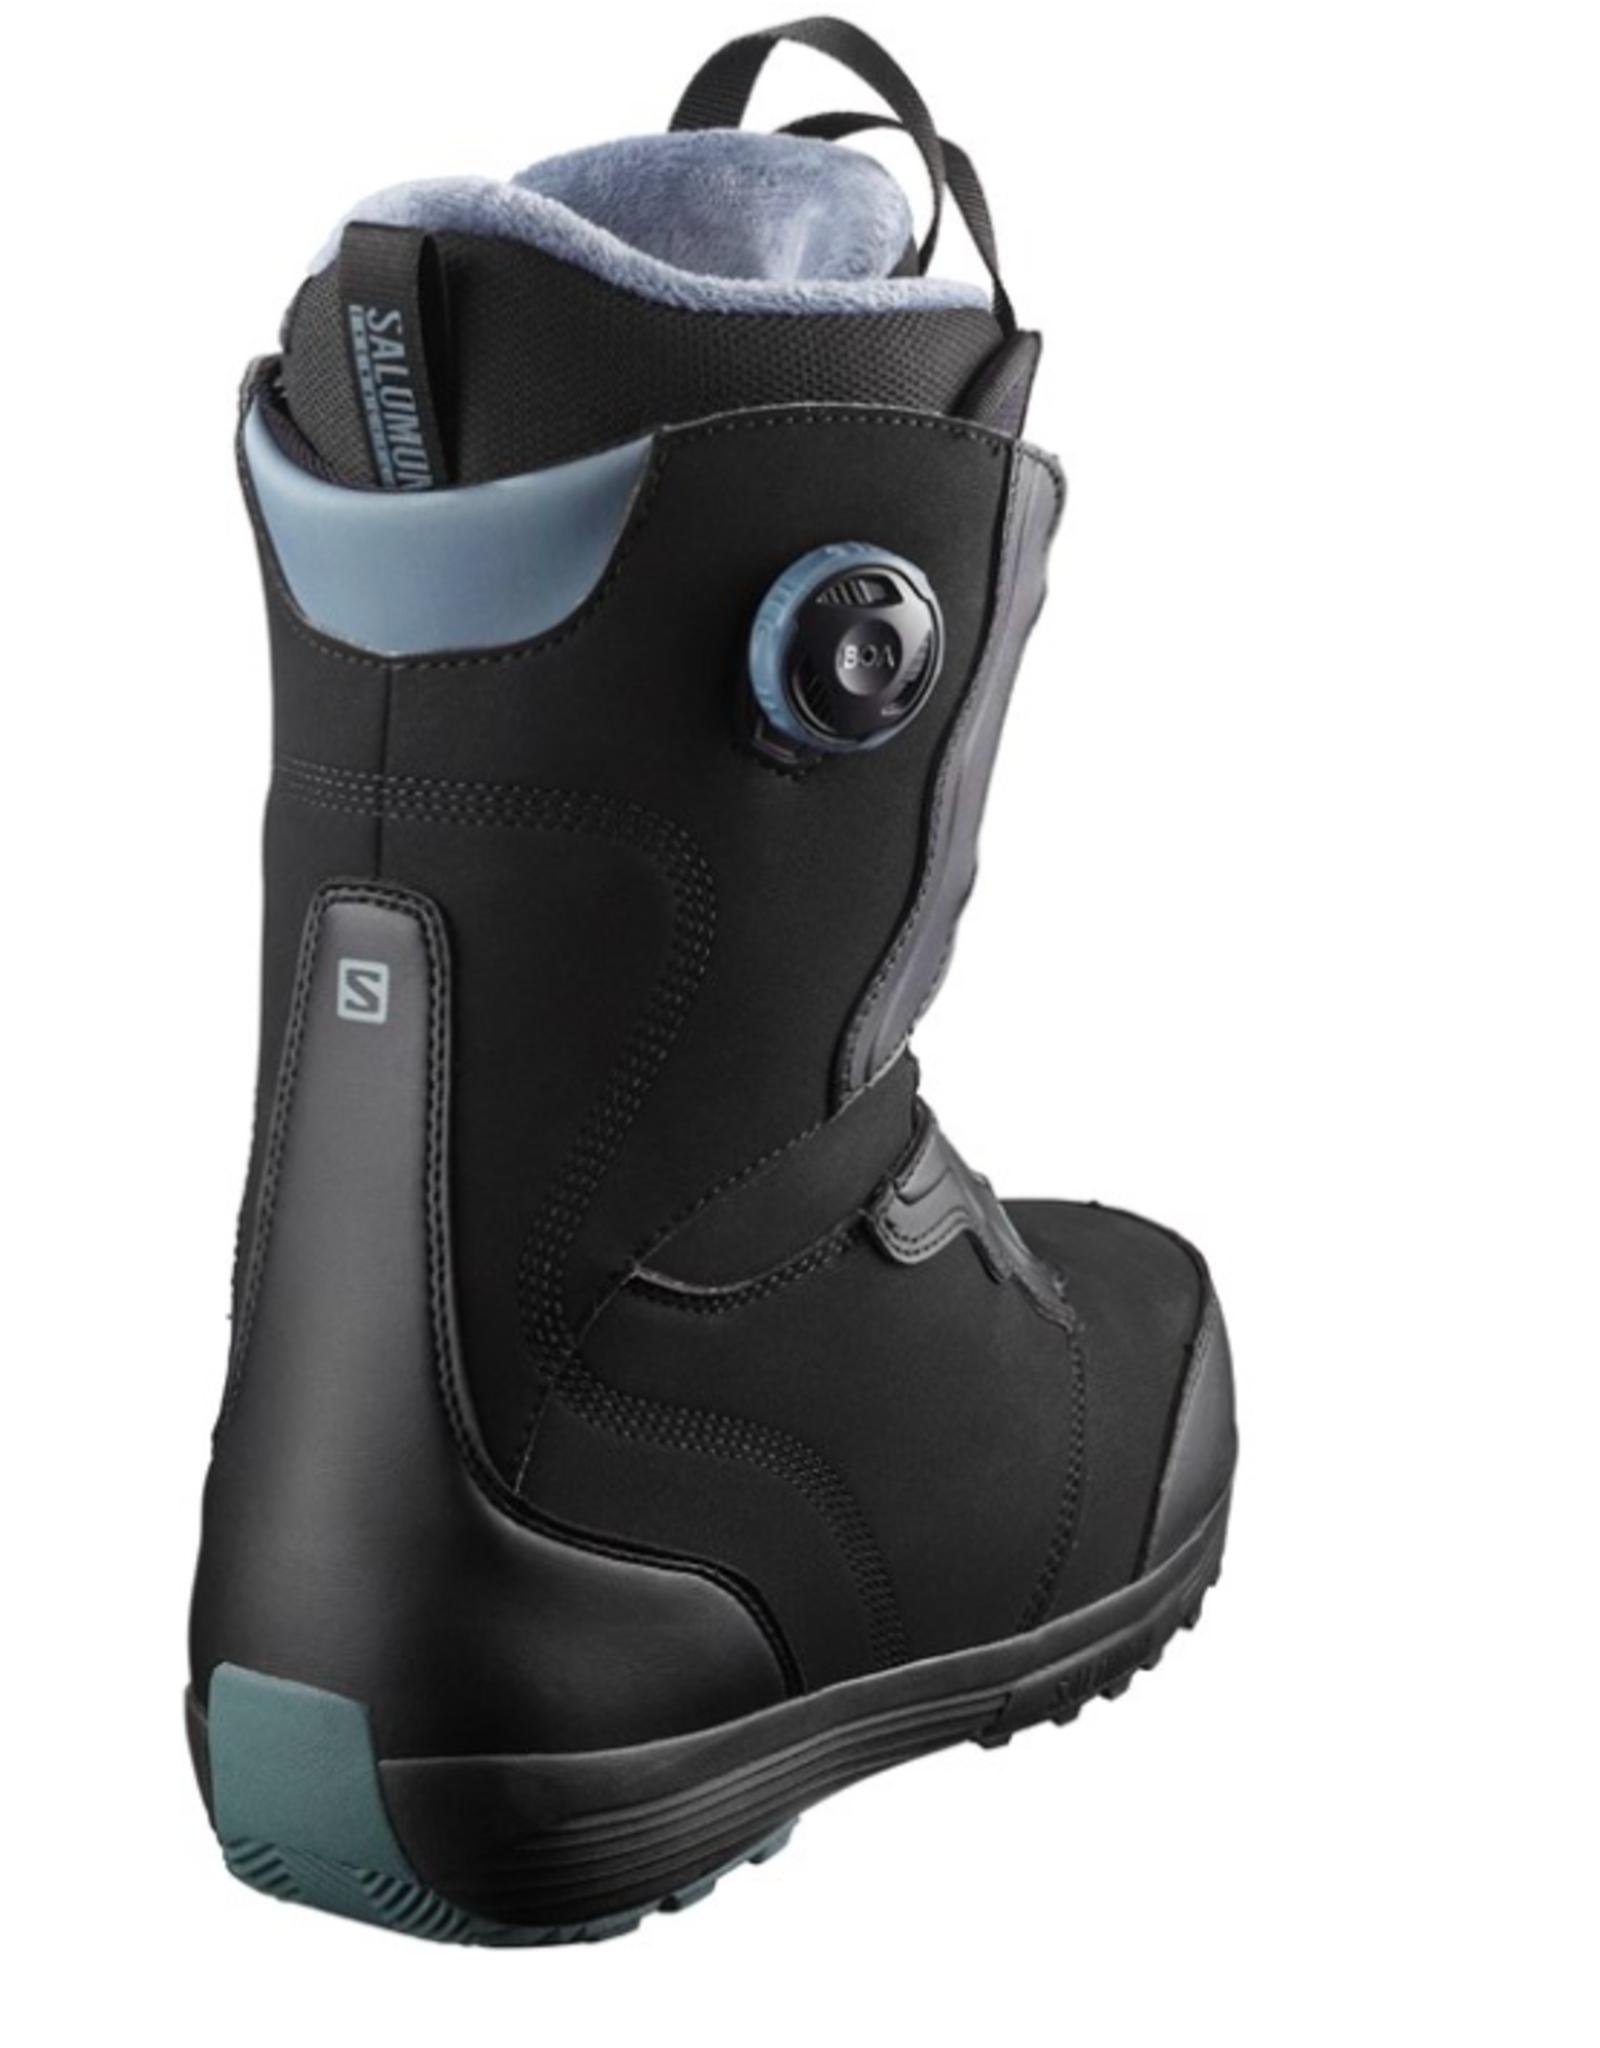 Salomon Women's Ivy SJ Boa Snowboard Boots Black/Stormy Weather 2022